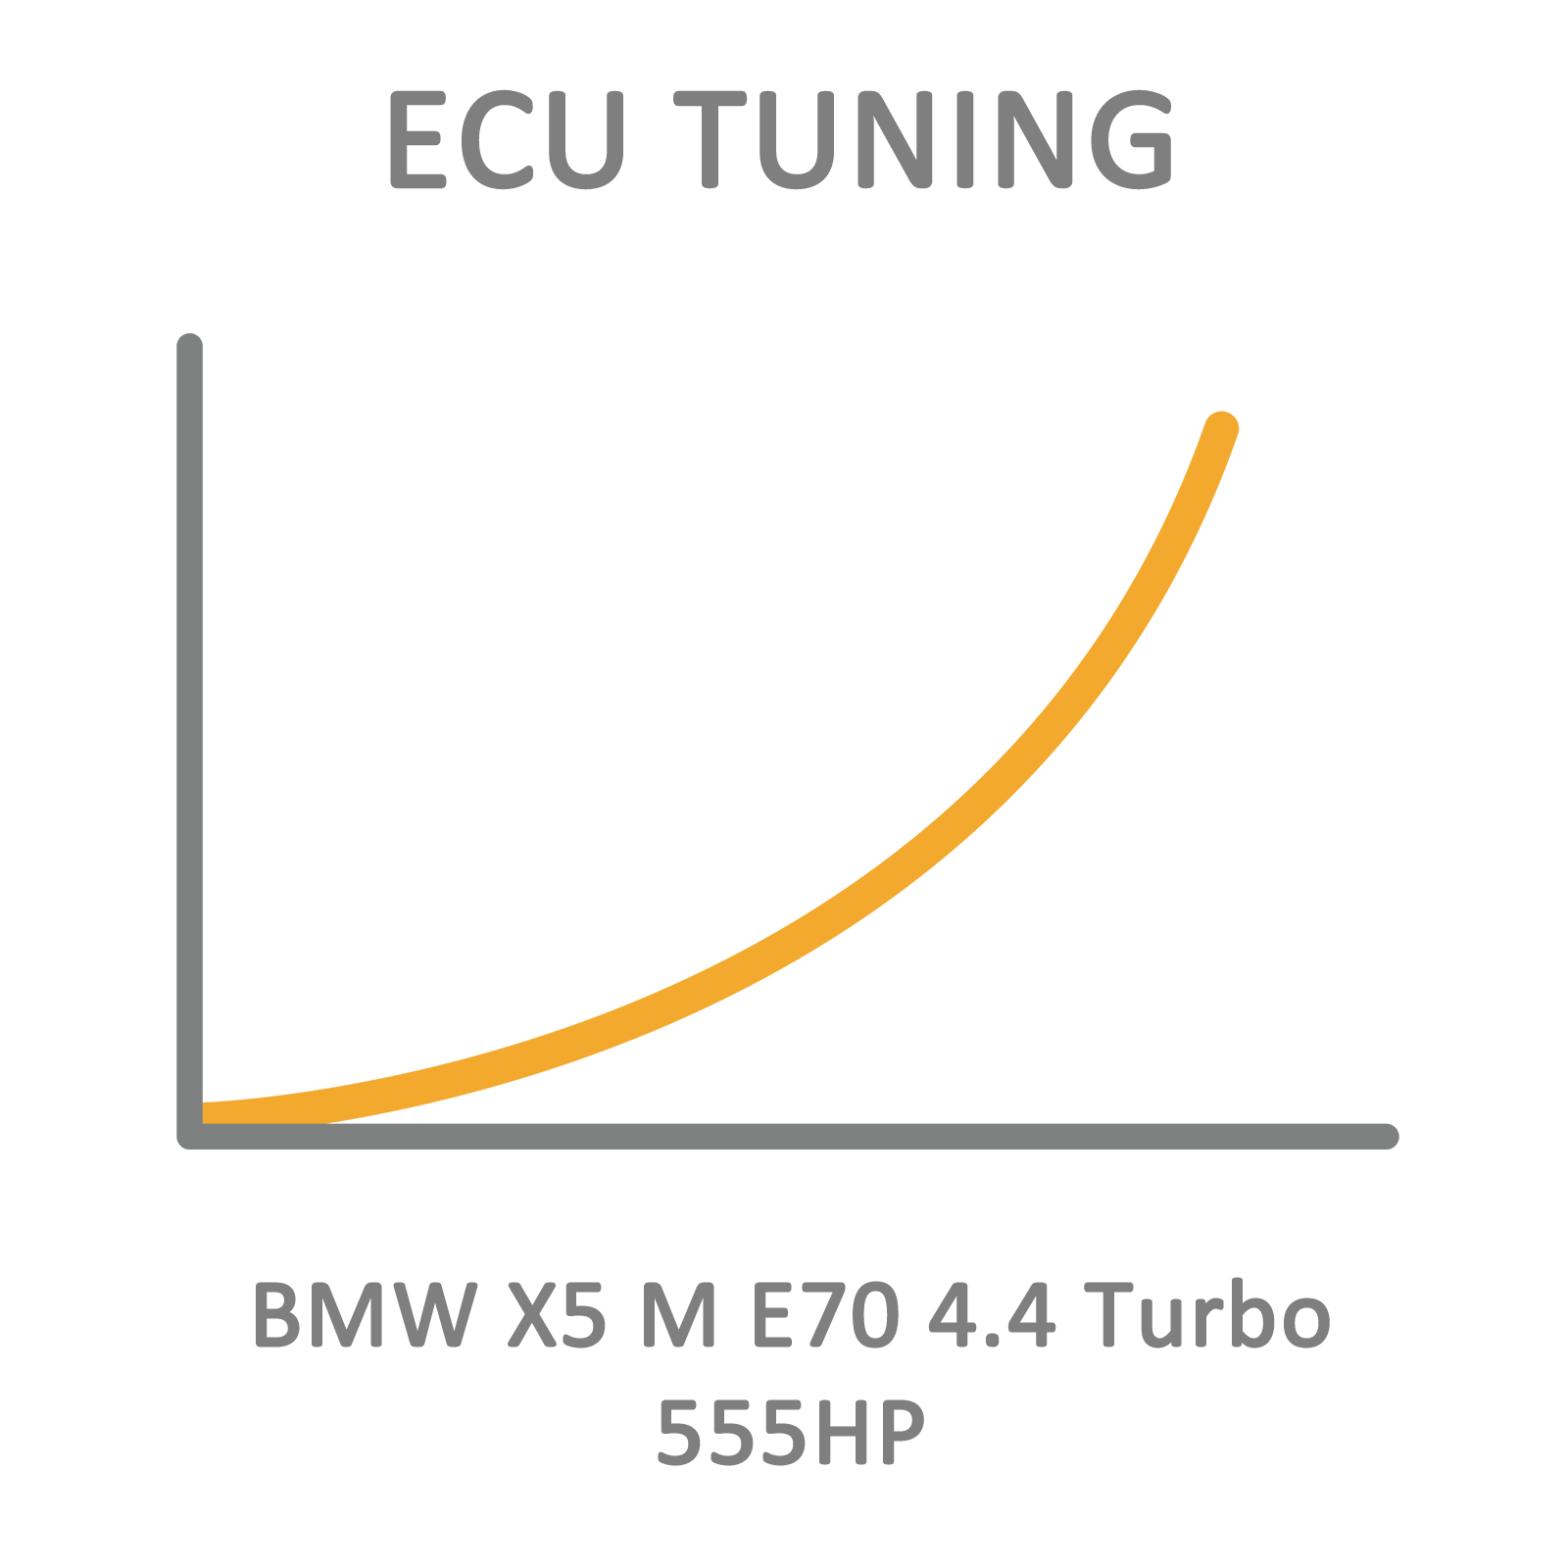 BMW X5 M E70 4.4 Turbo 555HP ECU Tuning Remapping Programming